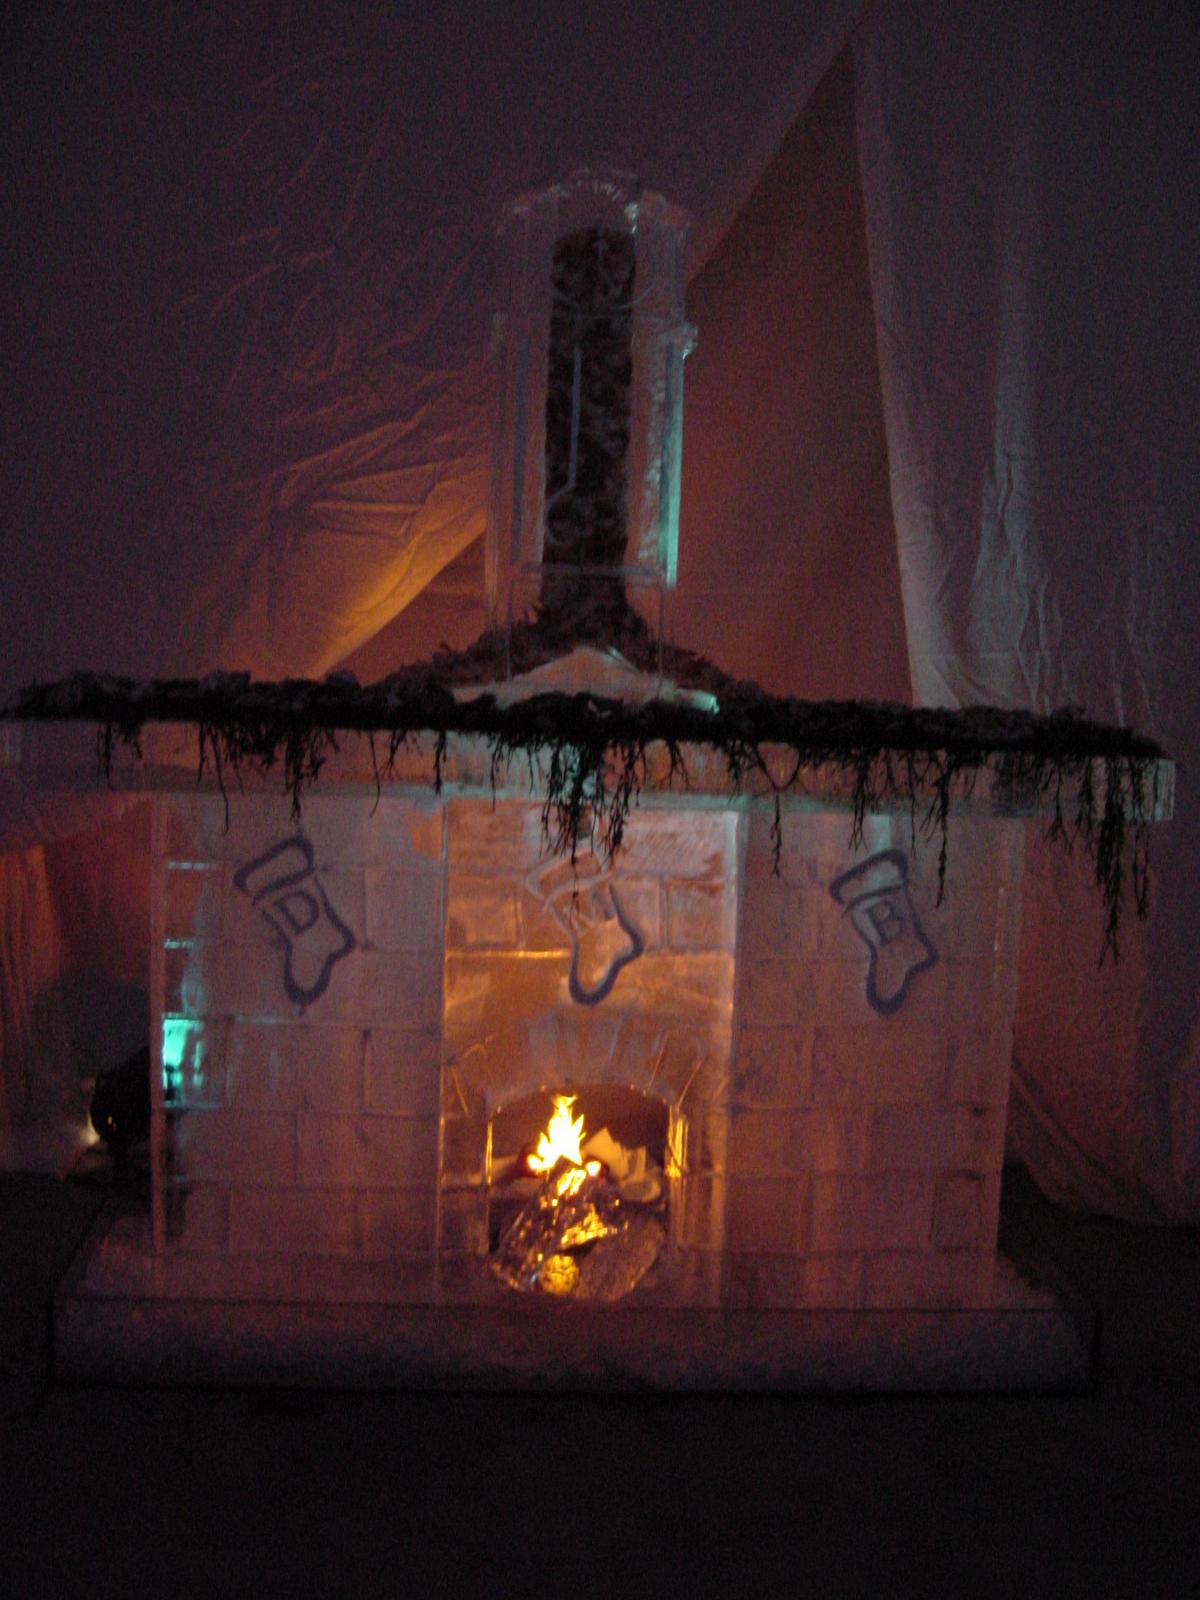 12-17-02 Fireplace 26.JPG